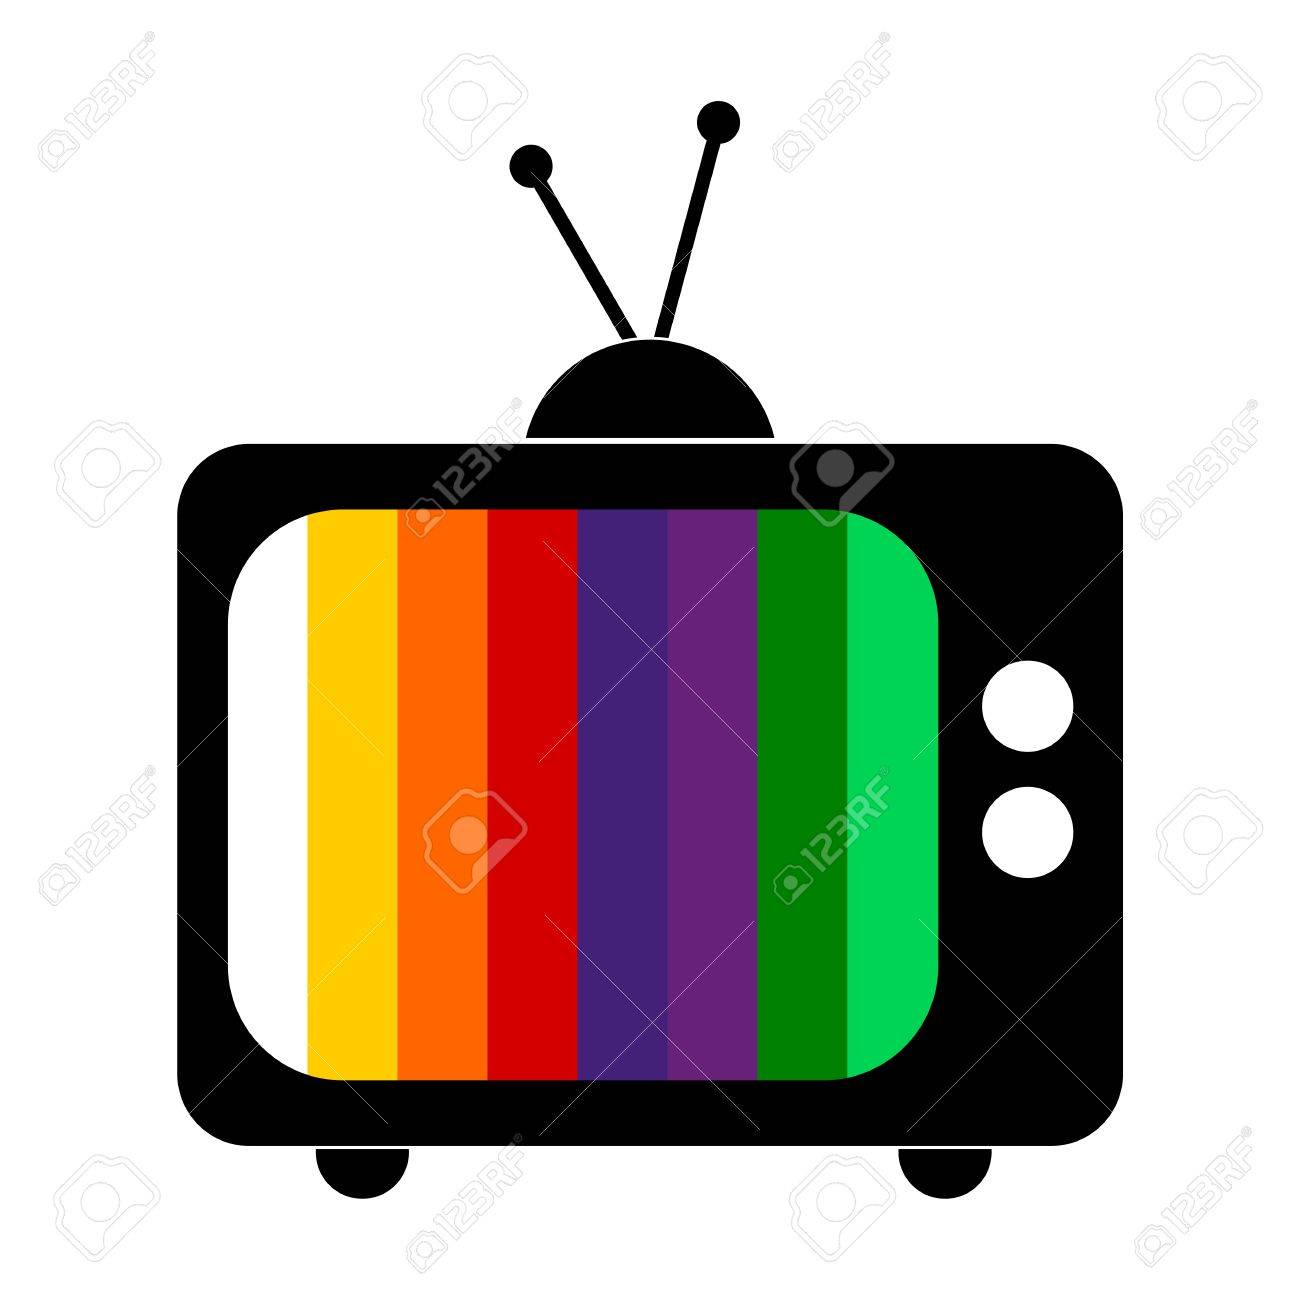 Tv icon no signal